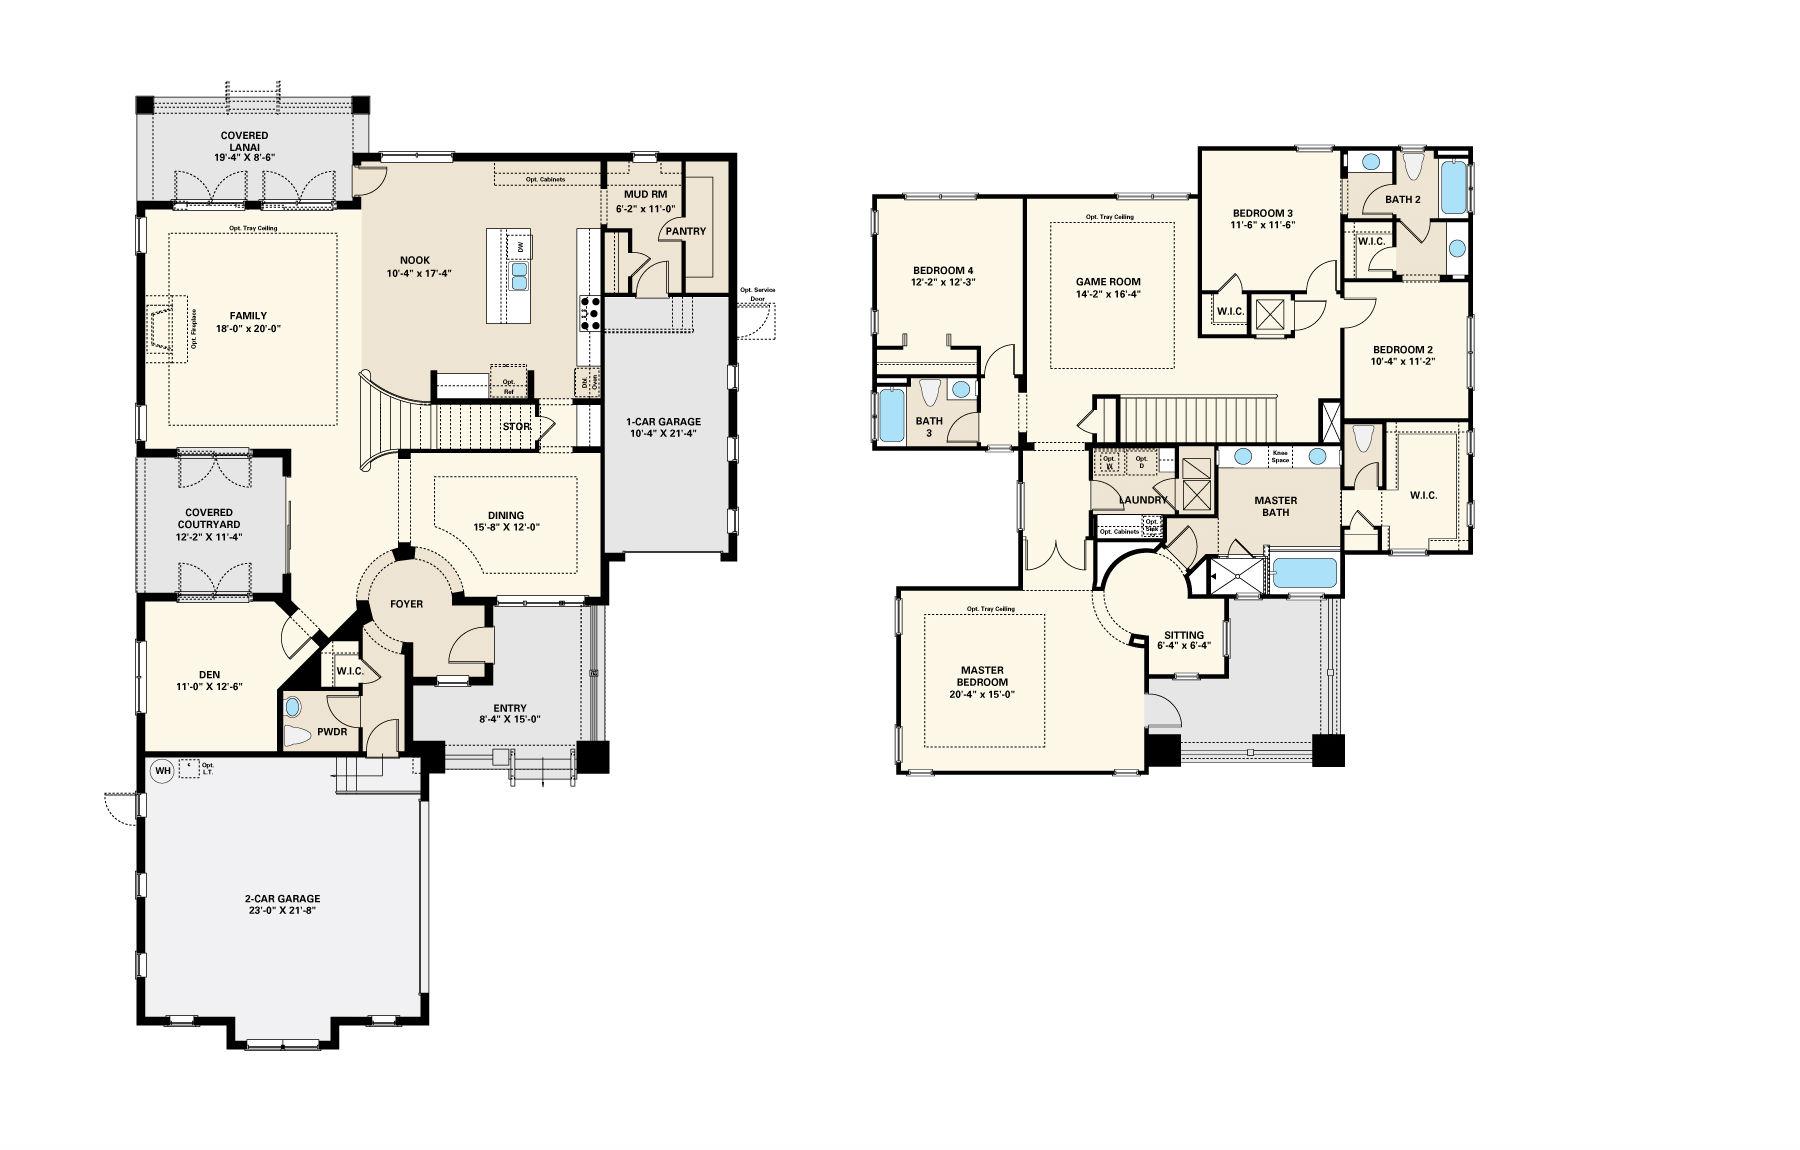 Taylor Morrison Homes Laureate Park Lake Nona – Morrison Homes Floor Plans